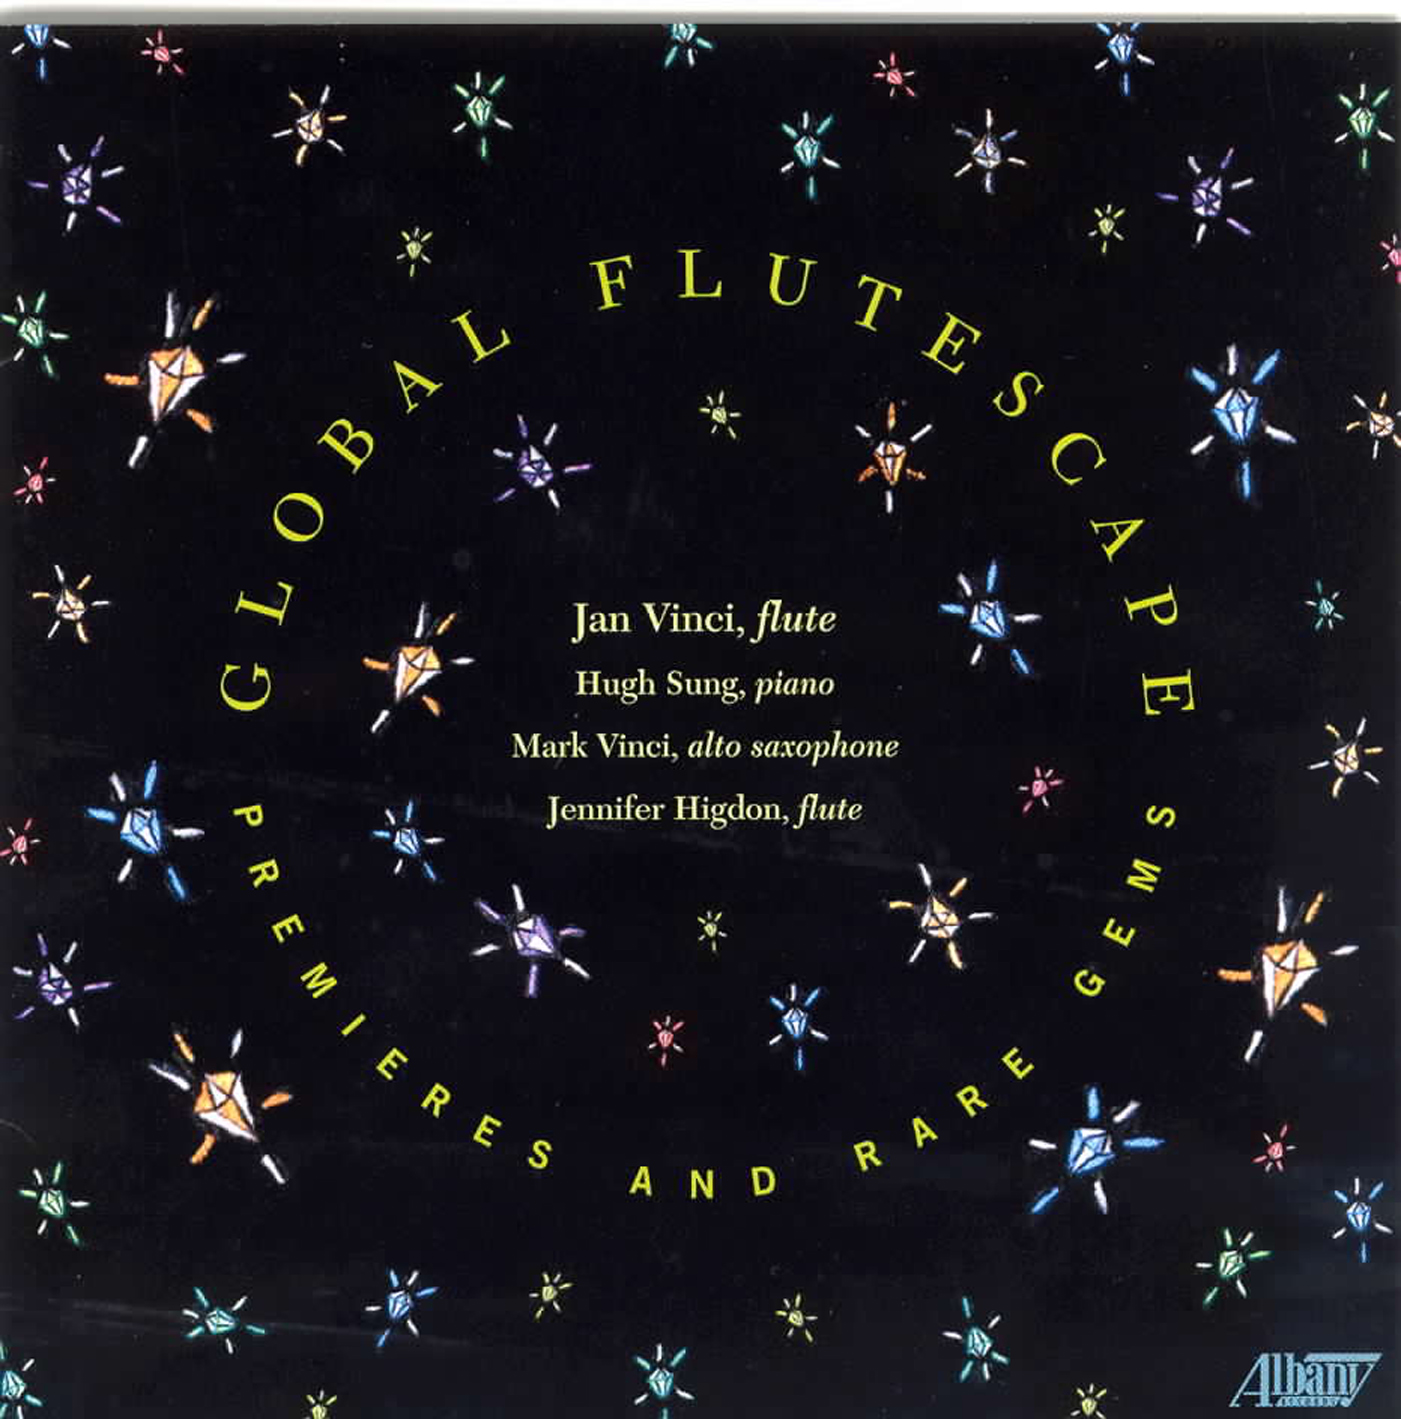 Benker, H.: Abreiss-Kalender (Der) (Miniature Suite for Flute and Piano) - Vaughan Williams, R.: Suite De Ballet (Global Flutesc